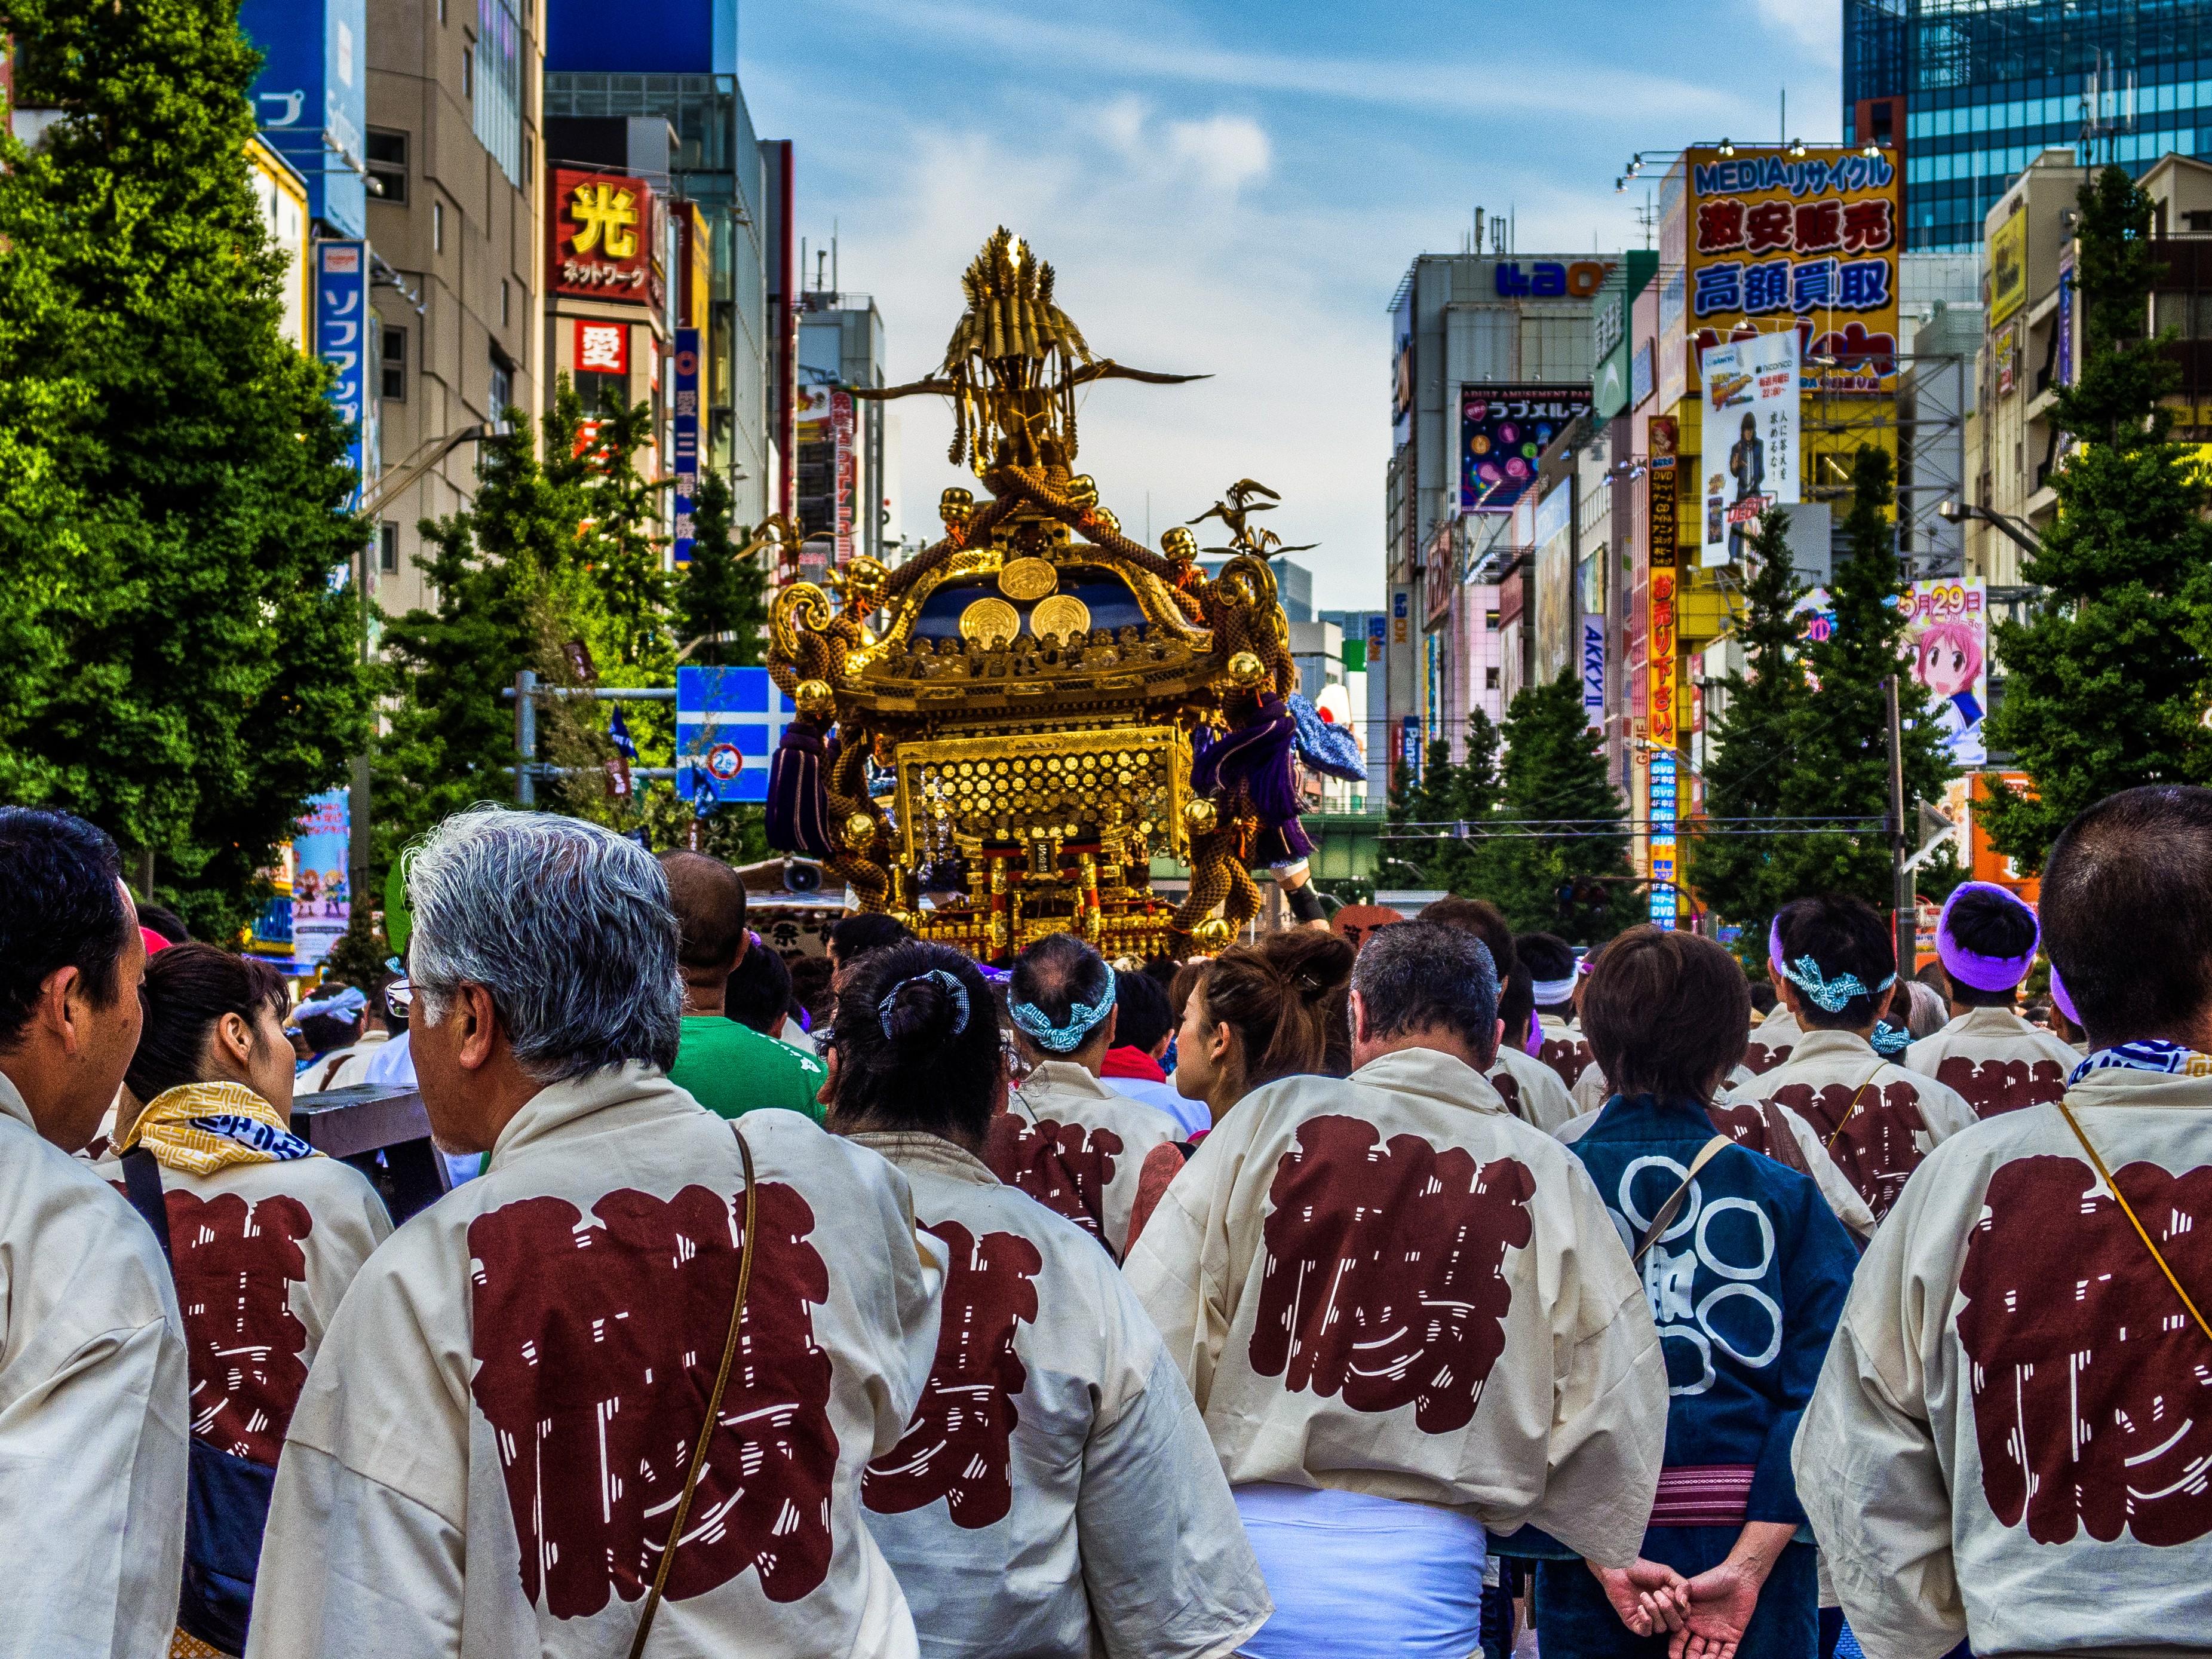 Cheapo Weekend for May 13-14: Kanda Matsuri and Thai Festival at ...